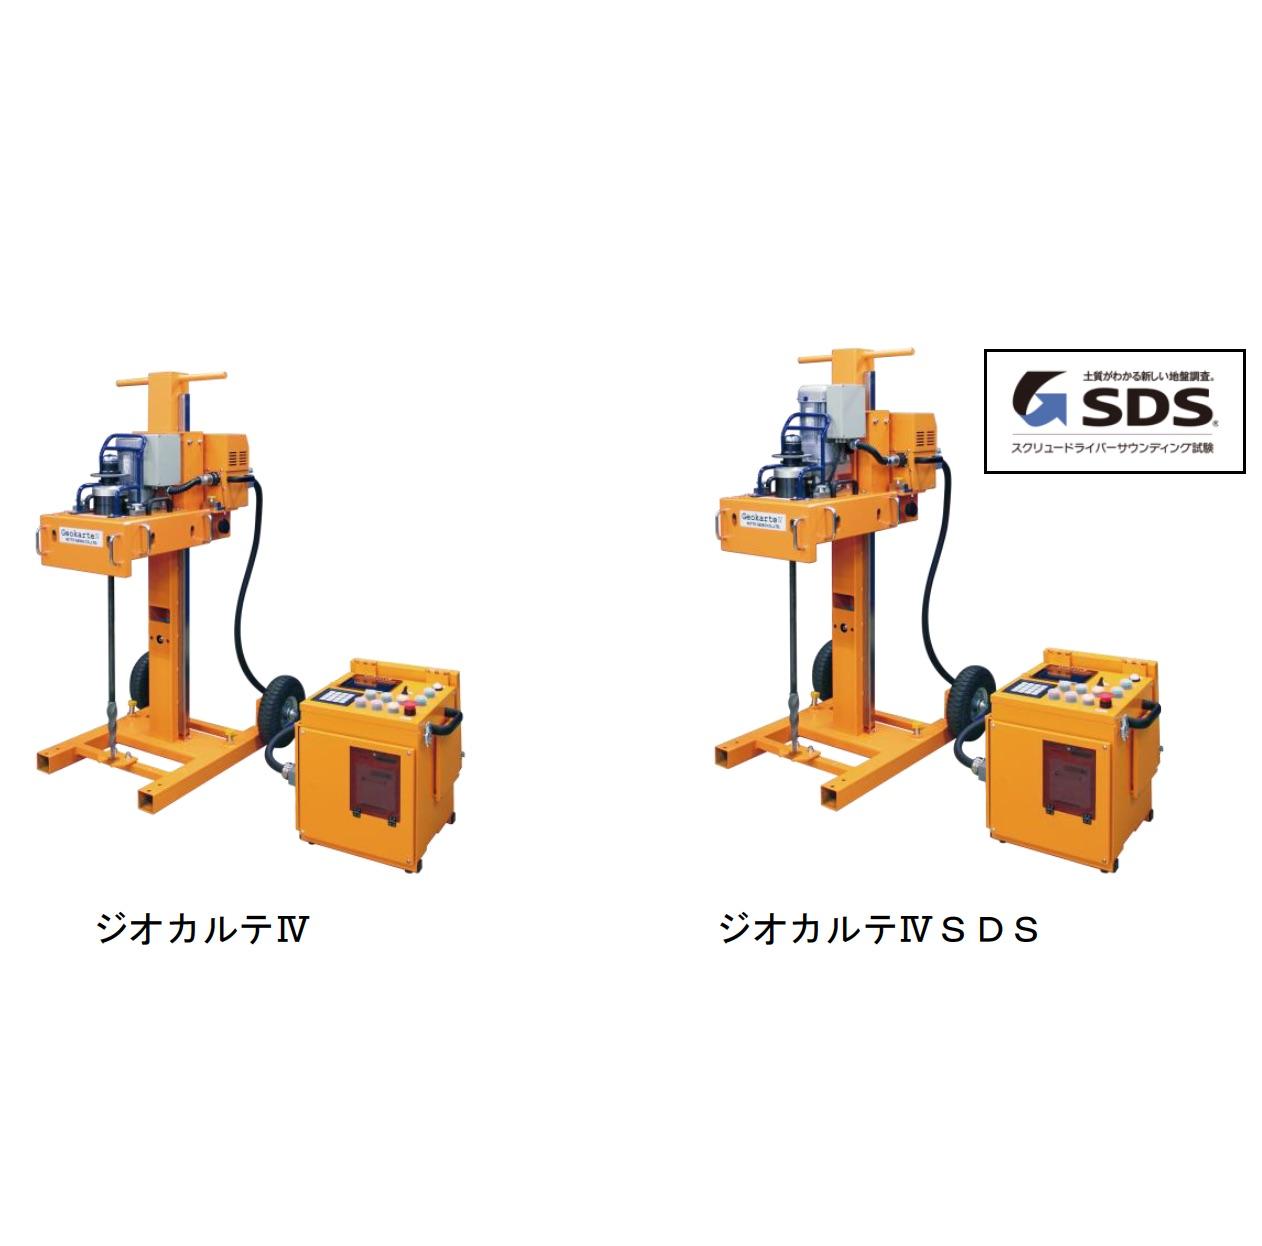 SDS自動貫入試験機「ジオカルテ」の作業効率向上